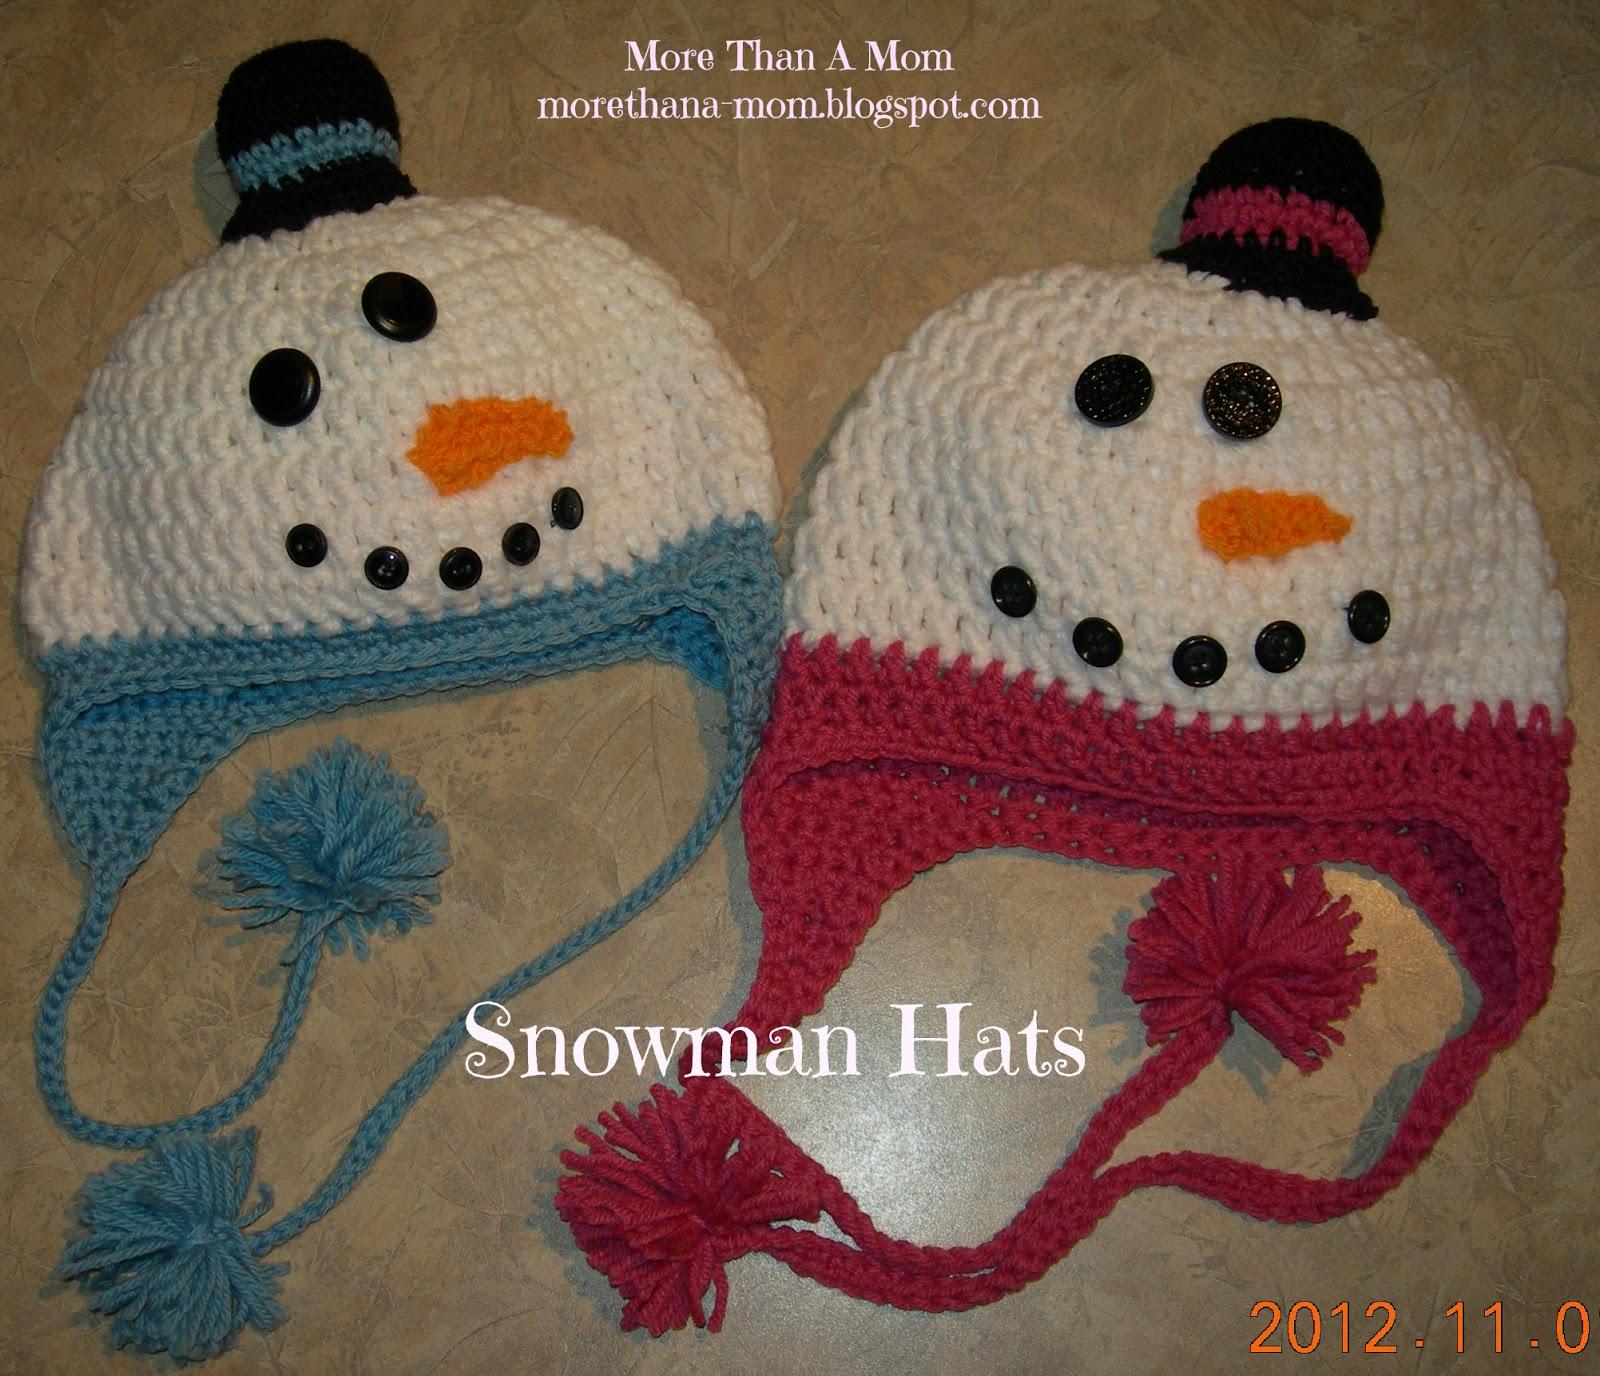 More Than A Mom: Crochet Snowman Hats